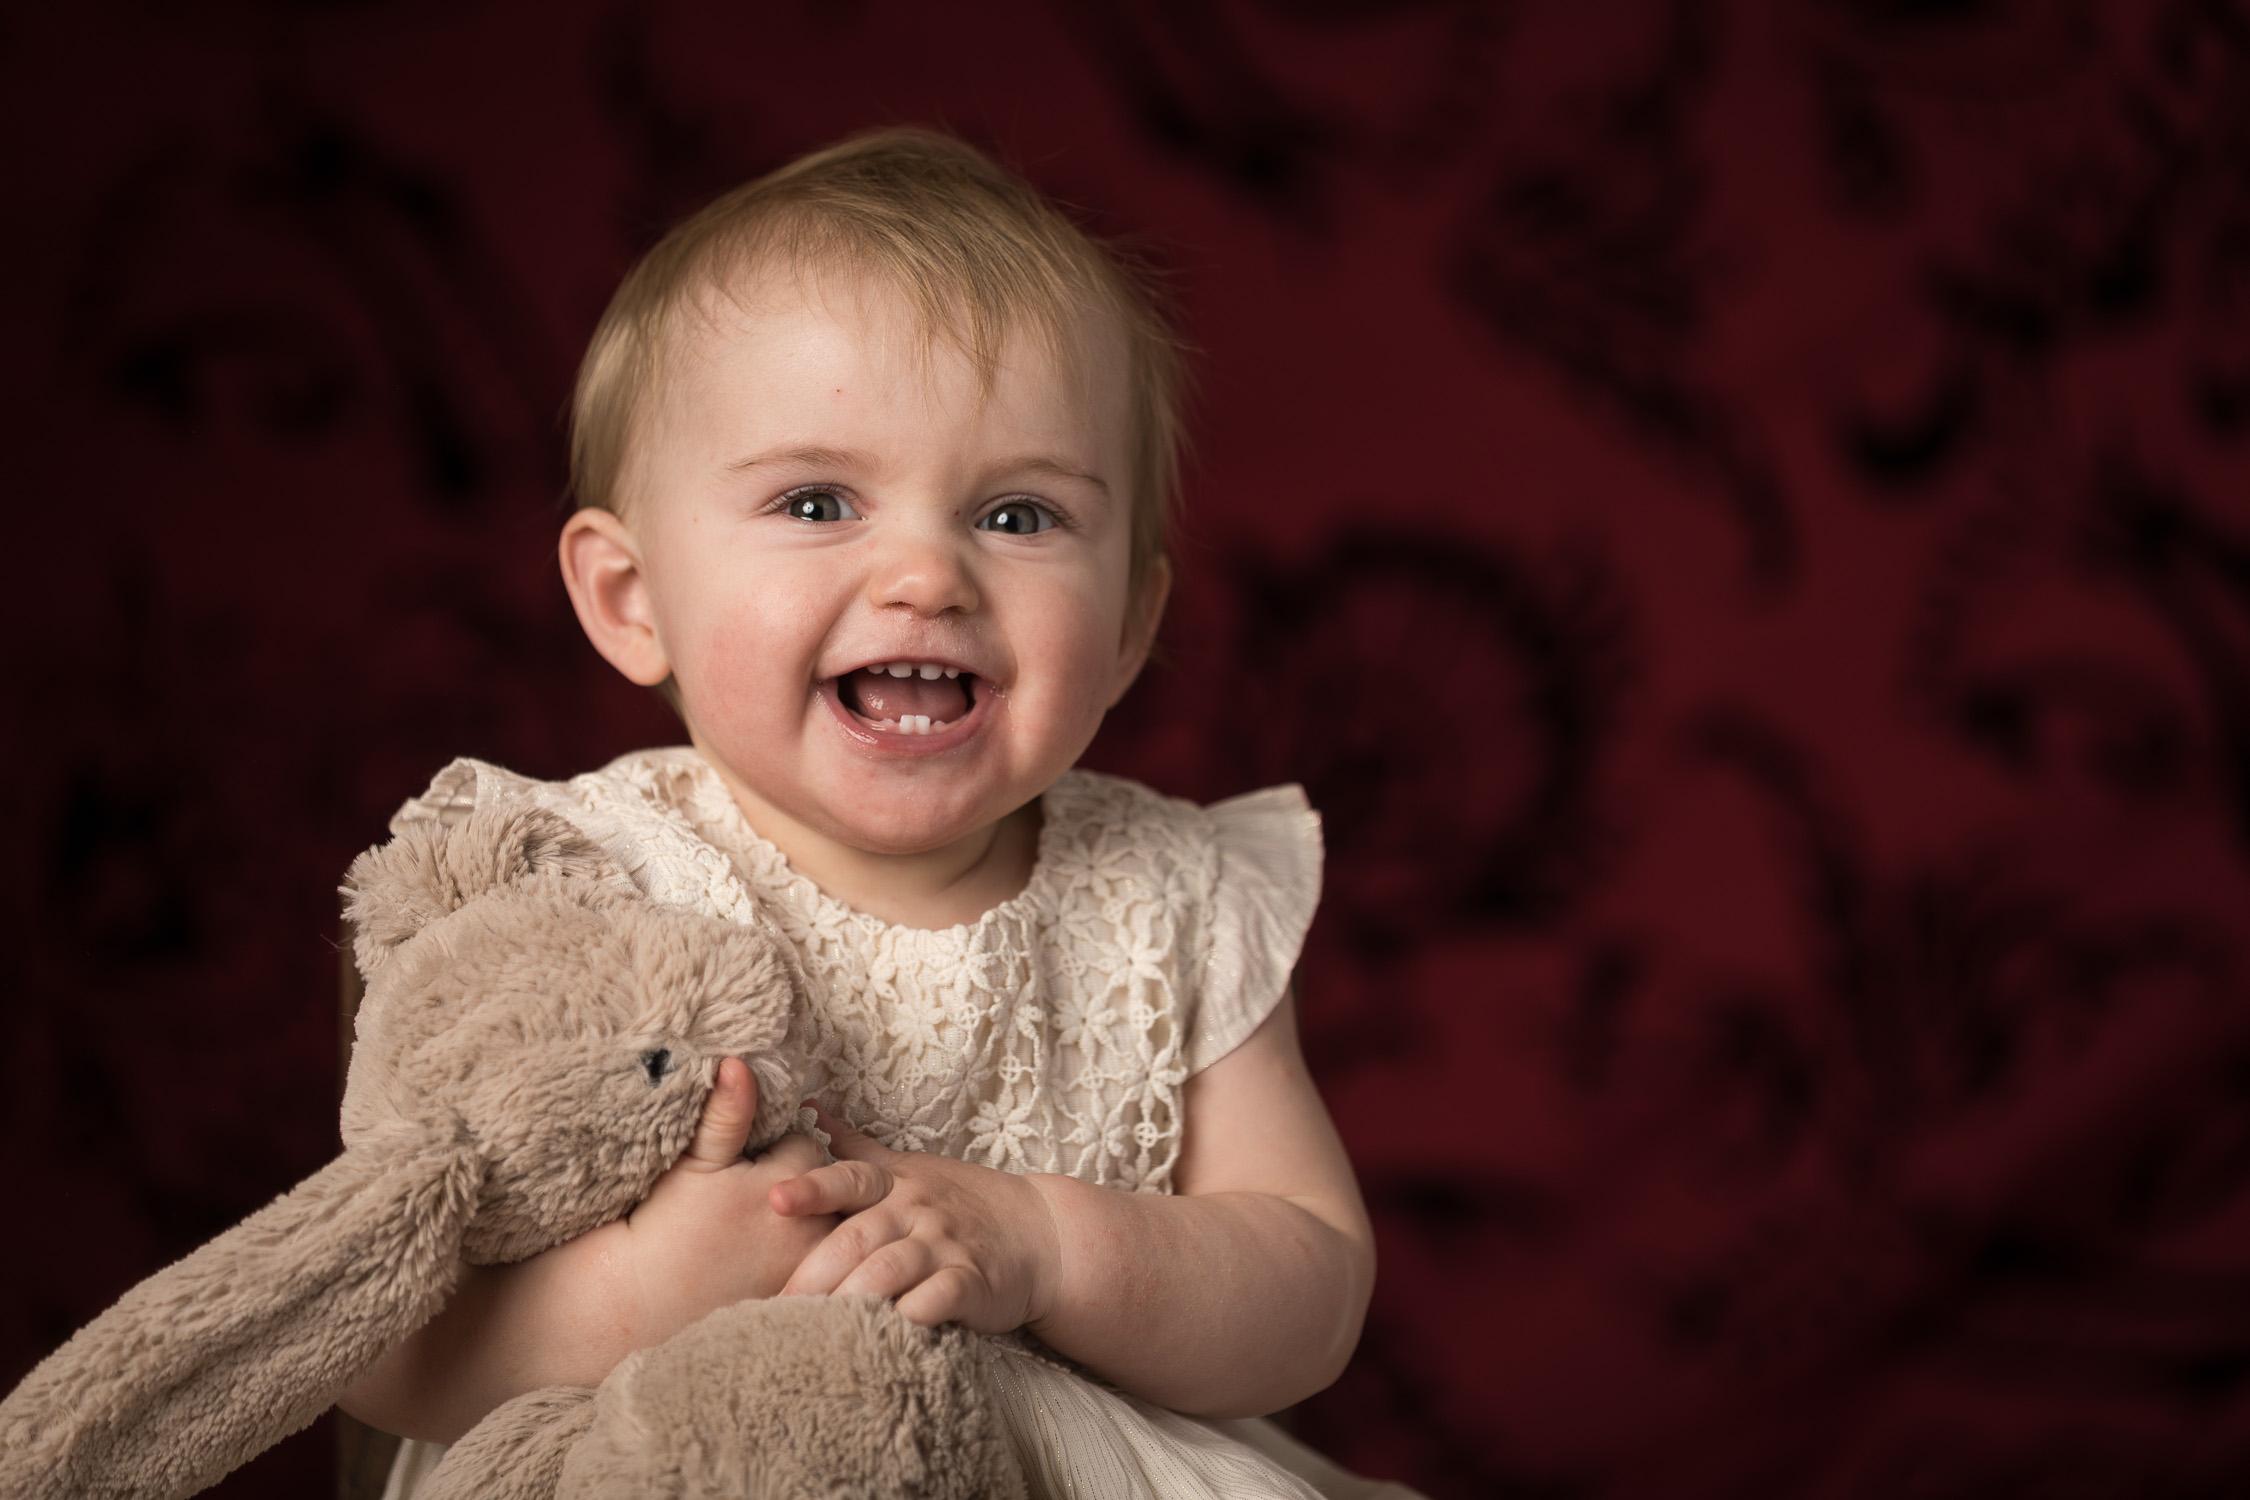 baby-babyfotograf-babyfotografering-fotograf-hodnedesign-pål-hodne--32.jpg